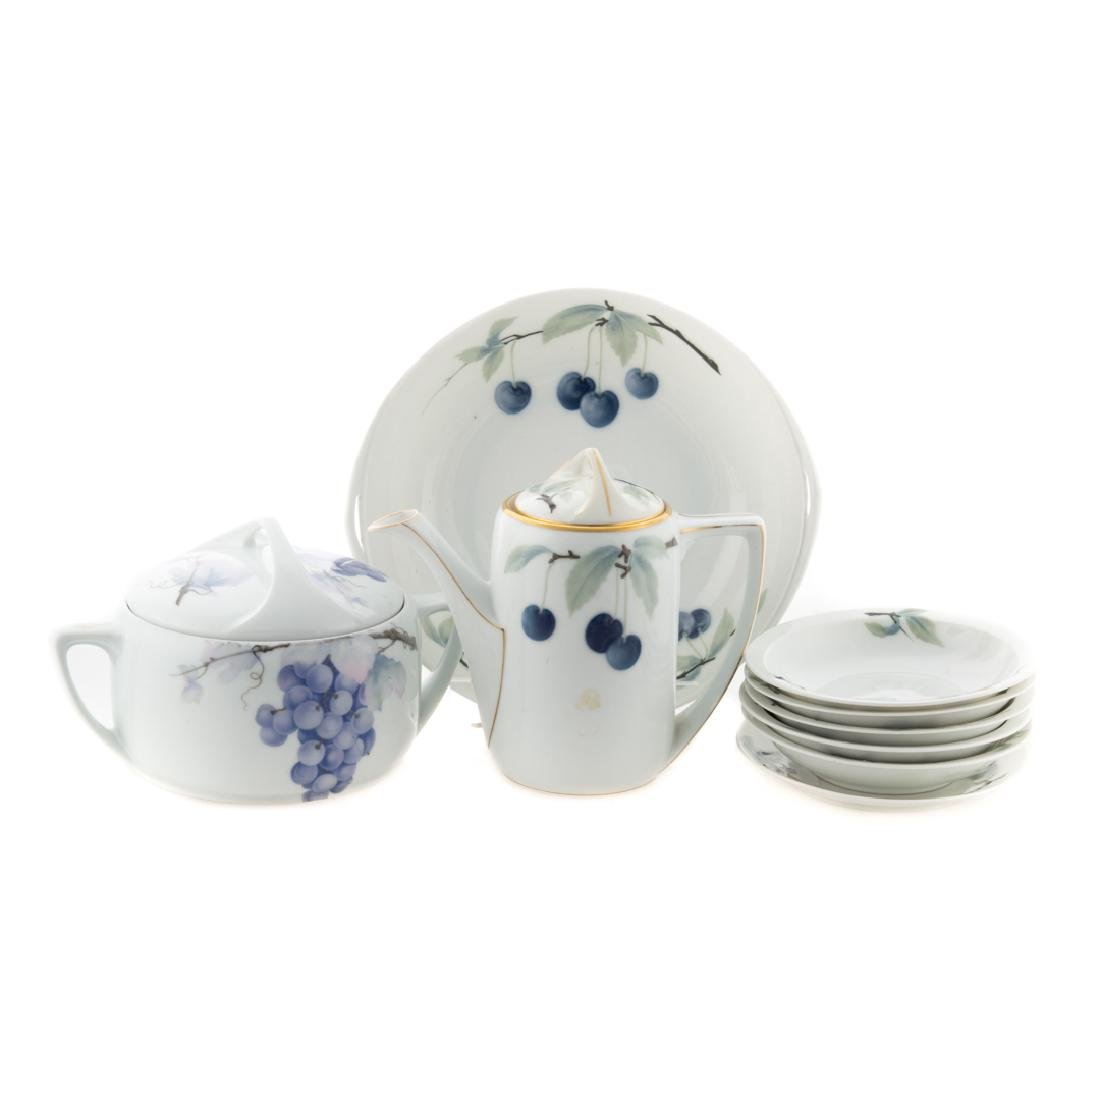 9 pcs. Rosenthal Pate-sur-Pate Donatello porcelain